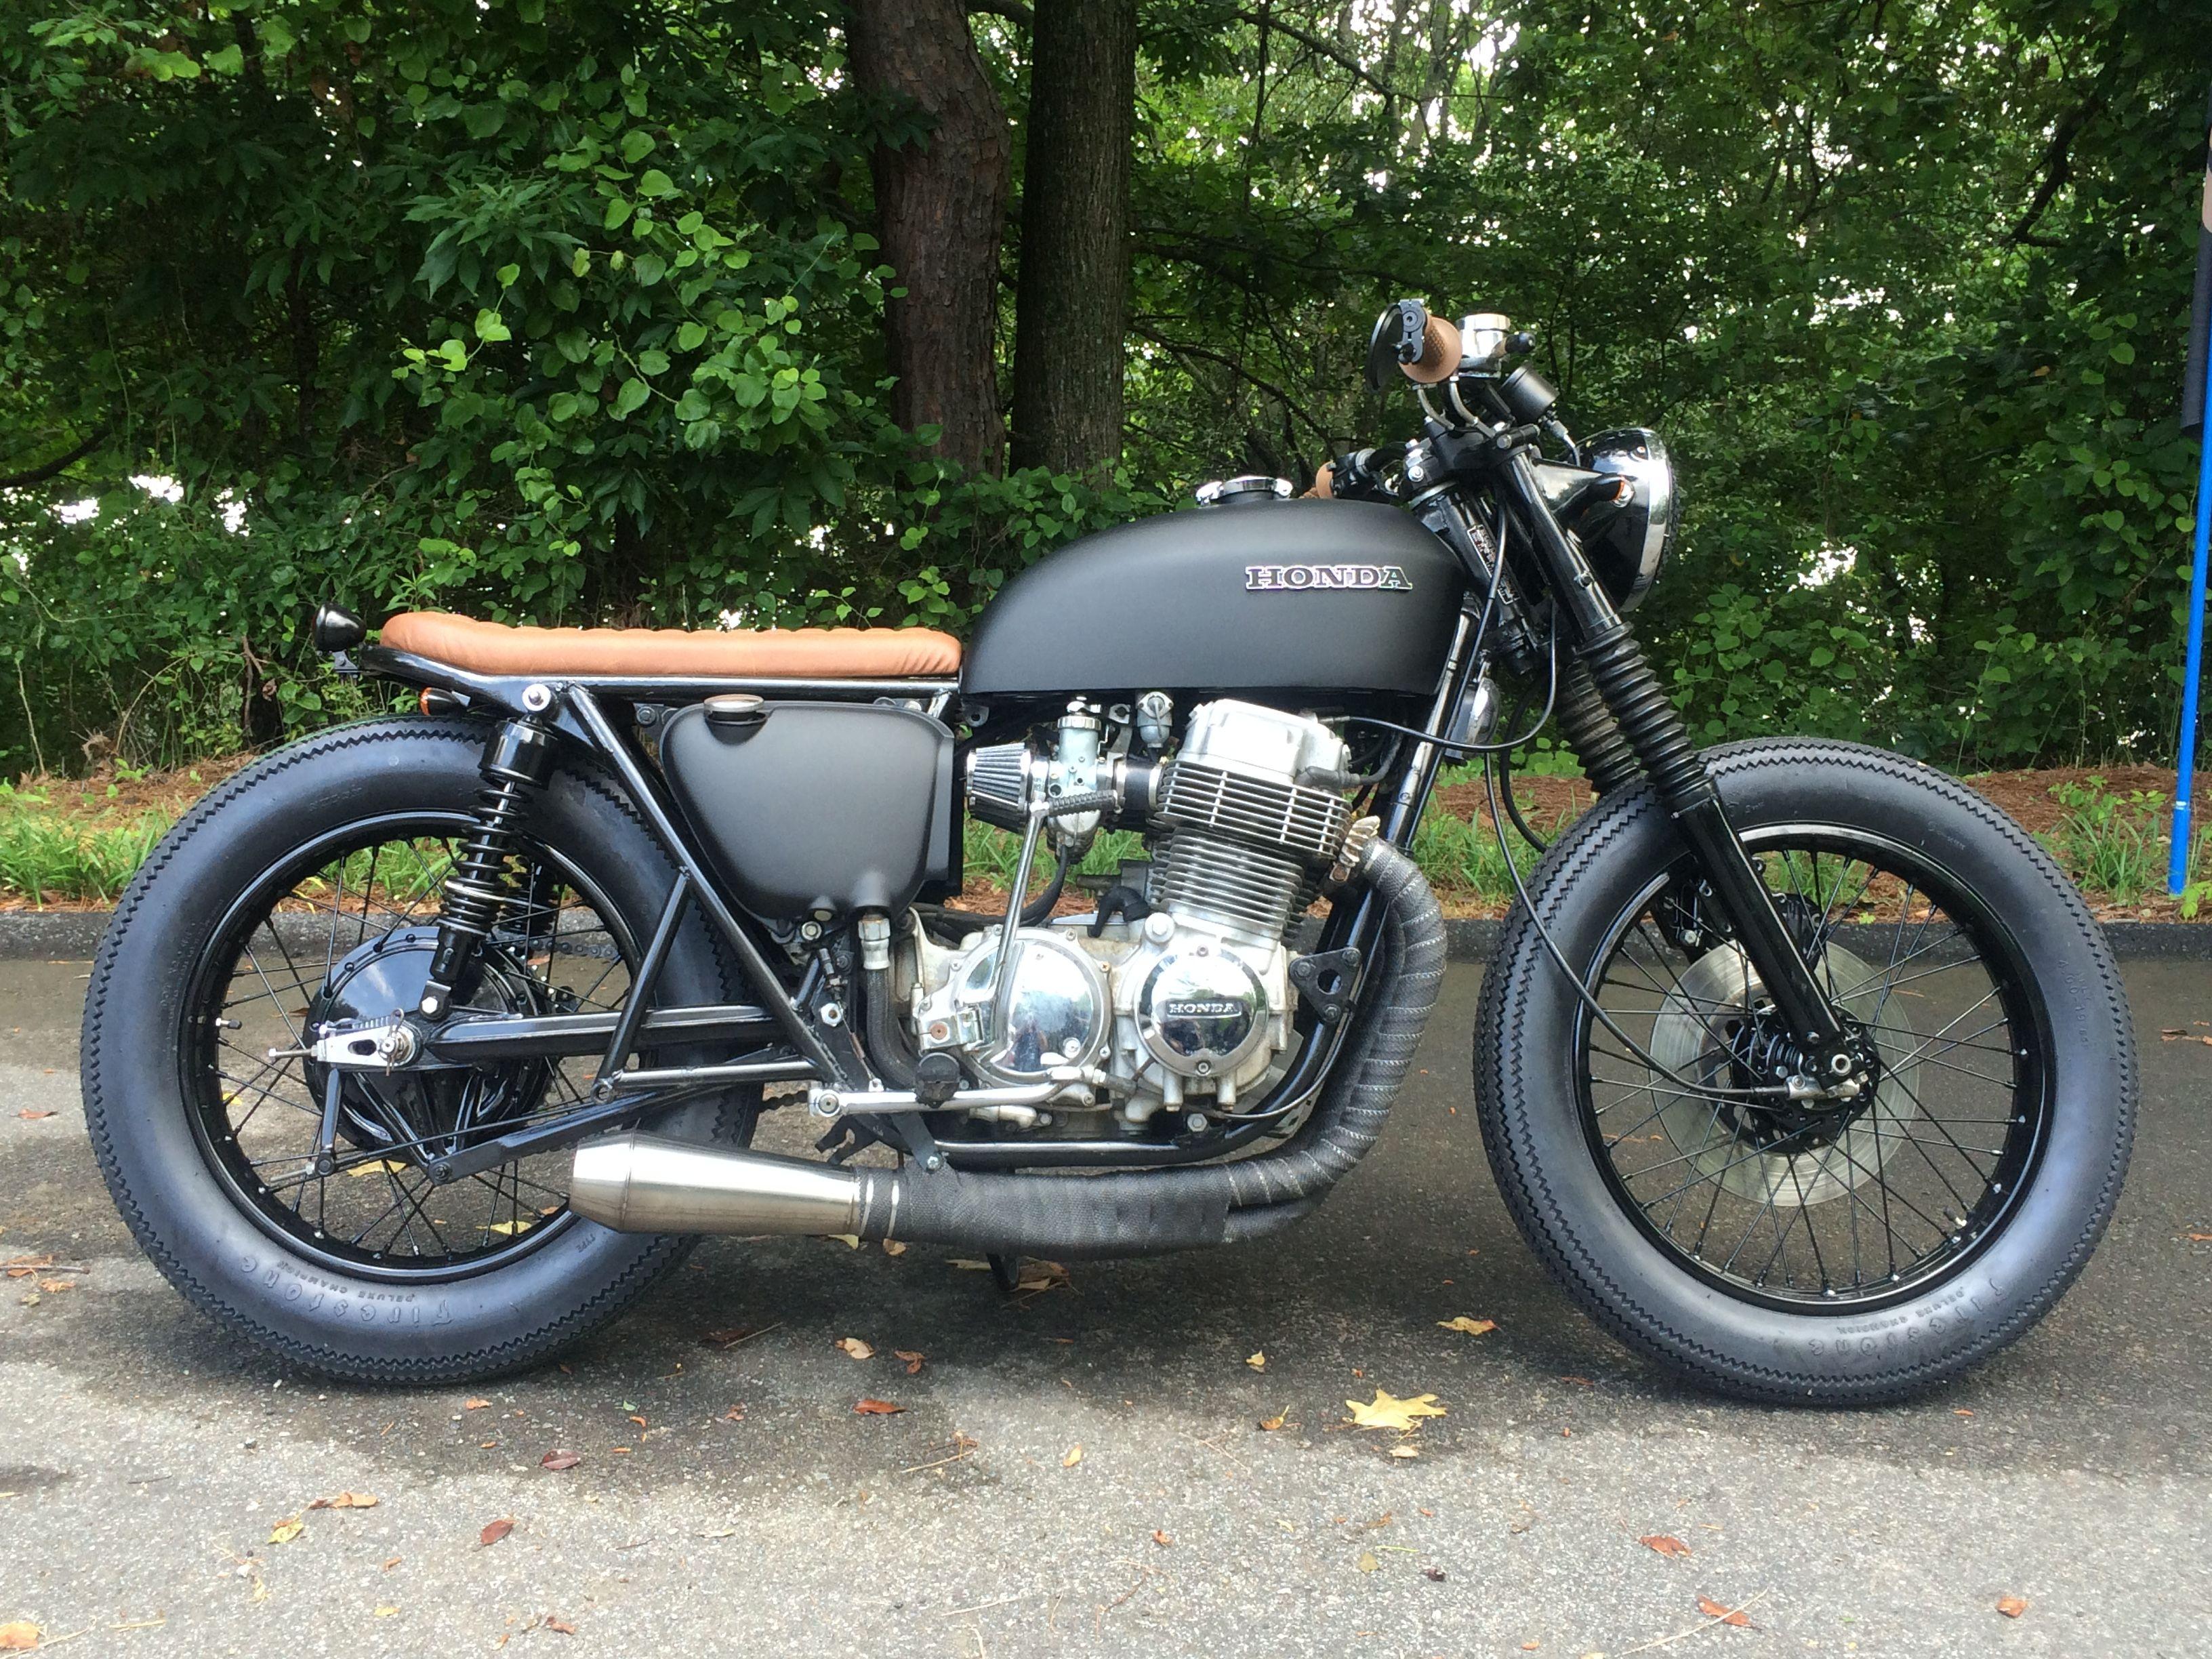 custom honda cb750 brat by atlanta motorcycle works [ 3264 x 2448 Pixel ]